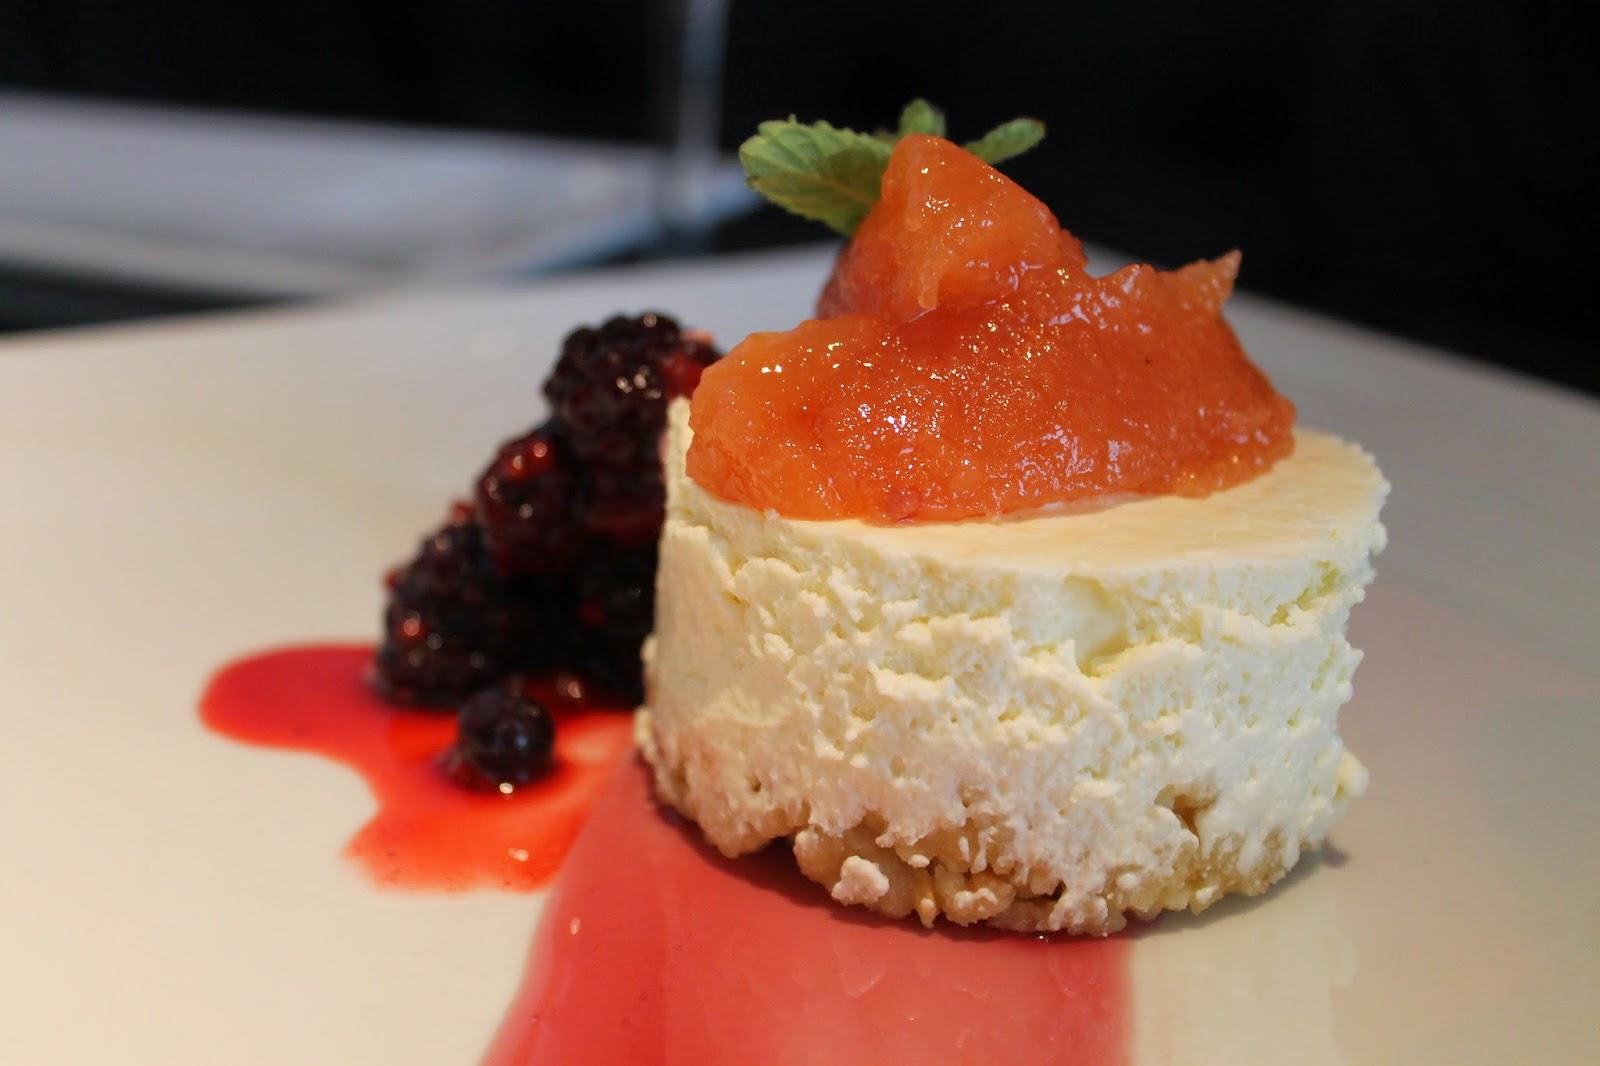 Chile cheese dessert